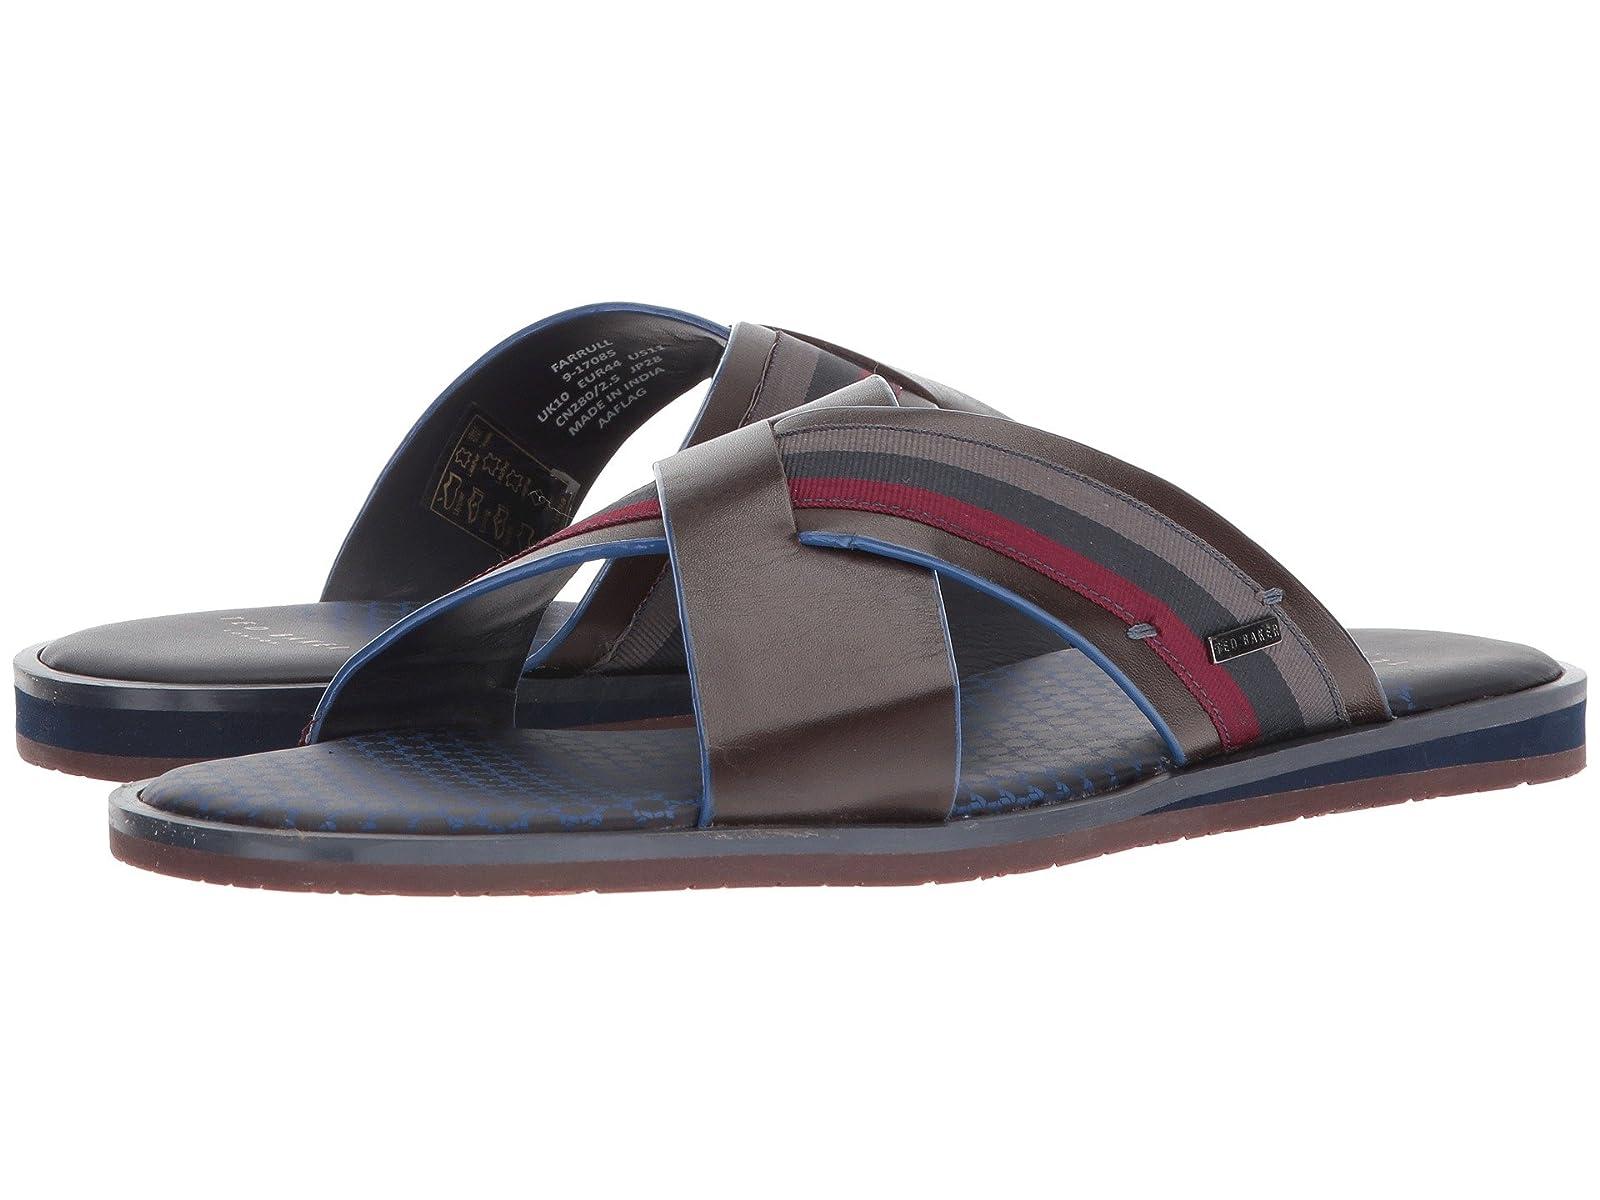 Ted Baker FarrullAtmospheric grades have affordable shoes